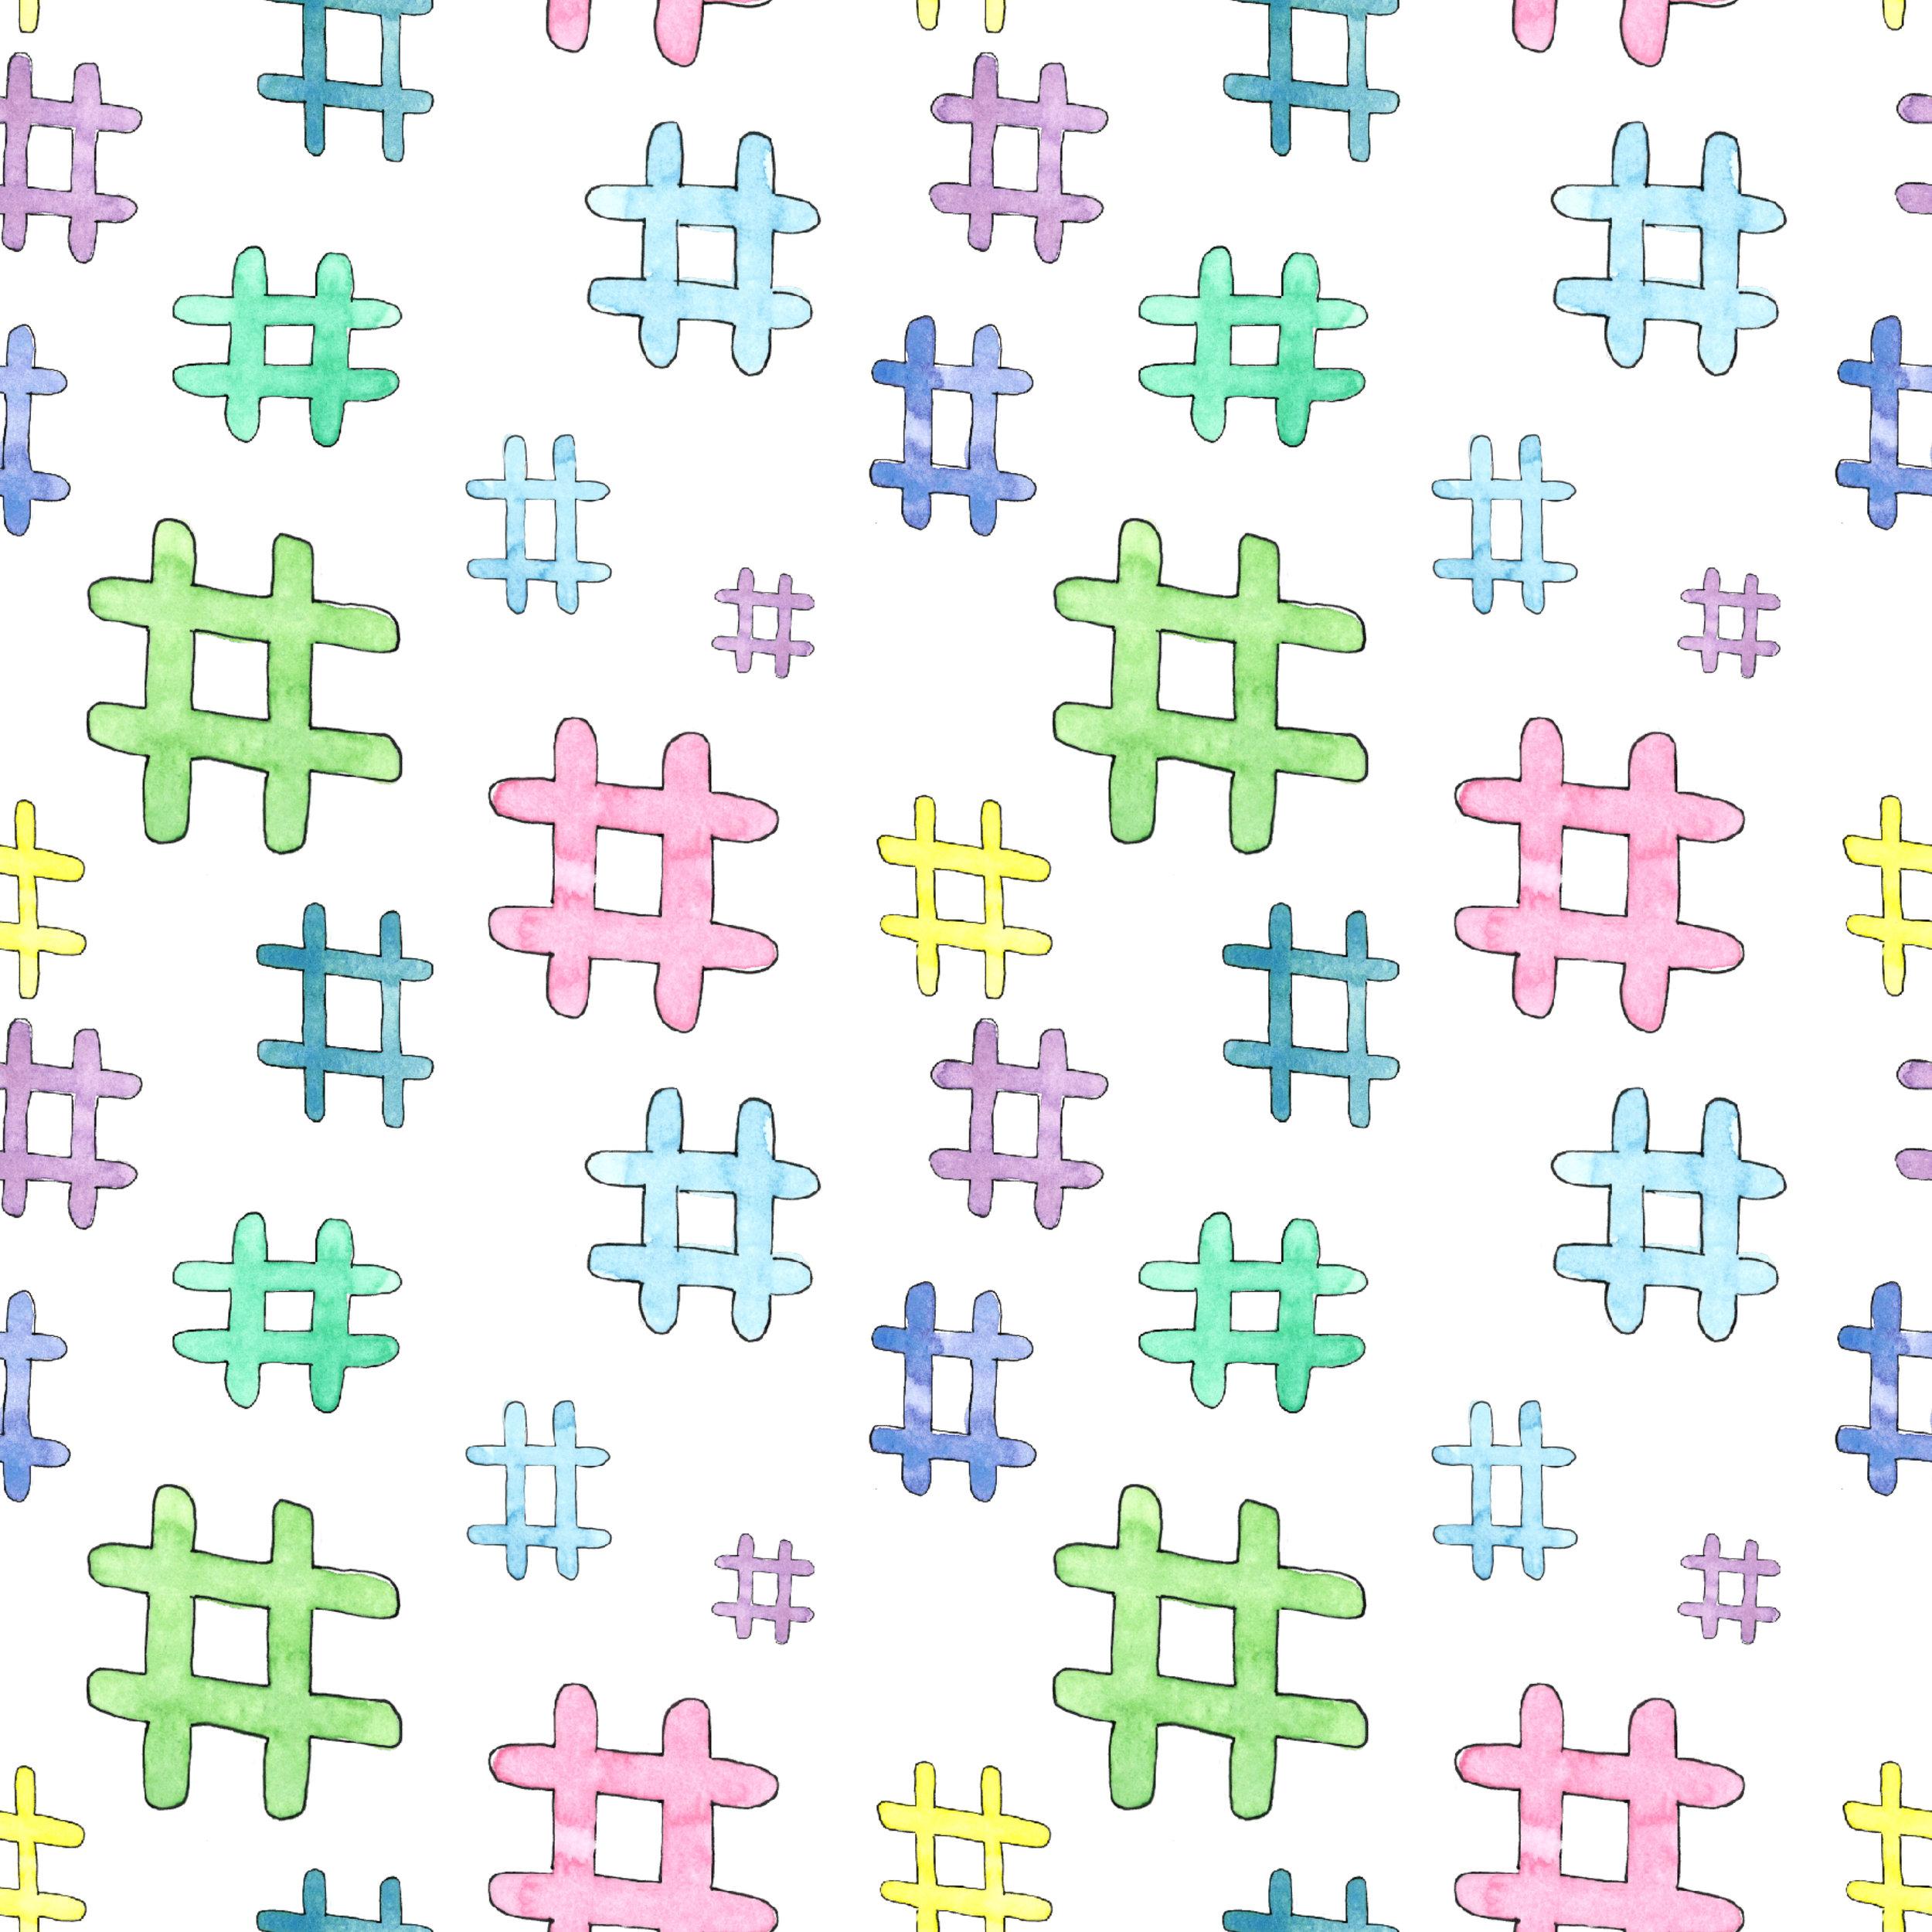 PatternHashtags12x12White.jpg